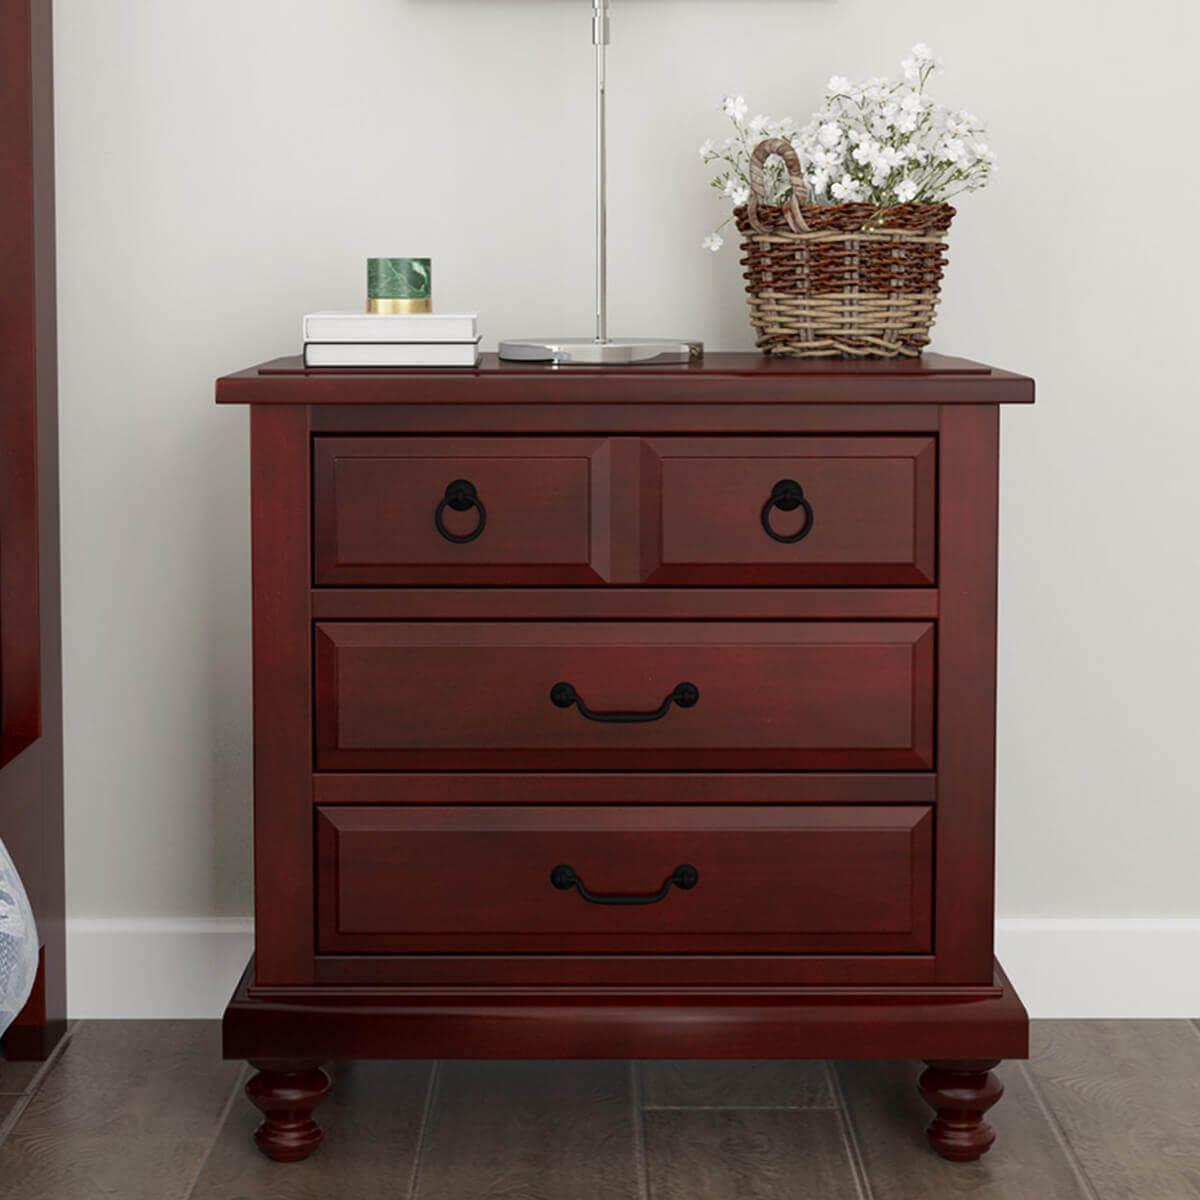 Iowa Traditional Style Mahogany Wood 3 Drawer Nightstand